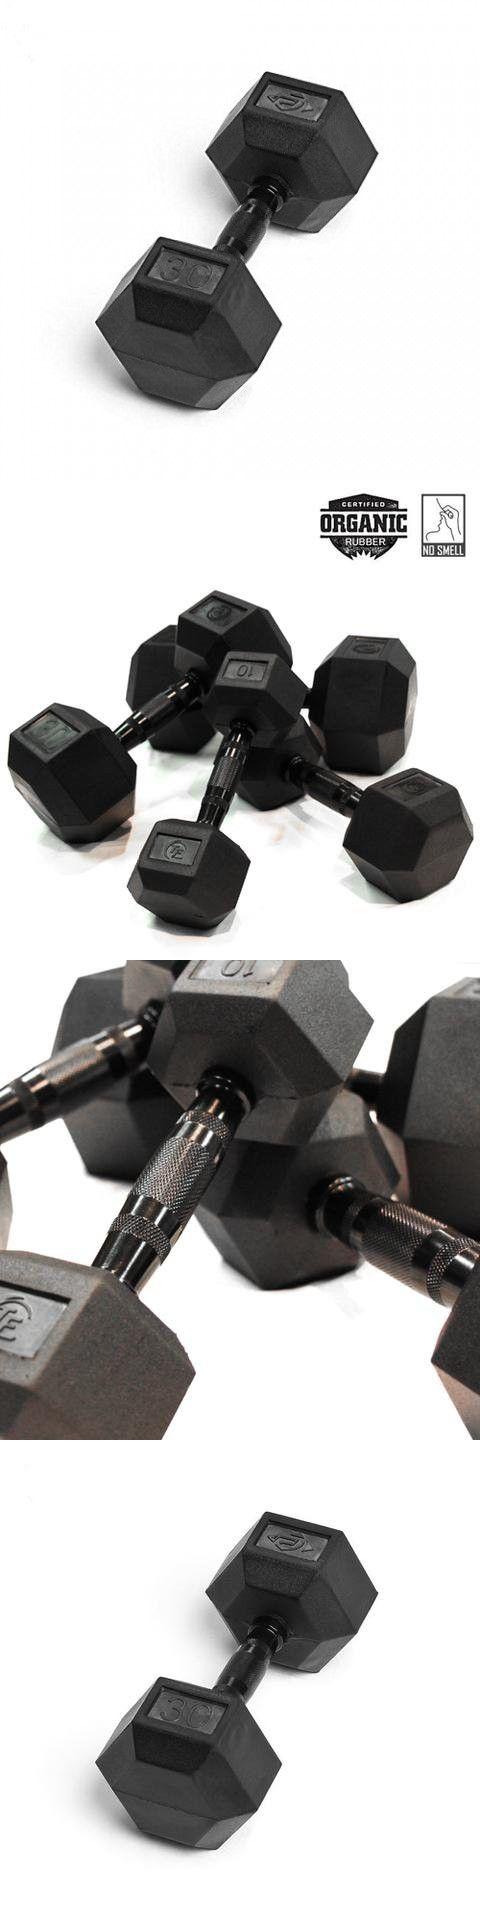 Element Fitness Virgin Rubber Commercial Hex Dumbbells - low odor- 30 lbs